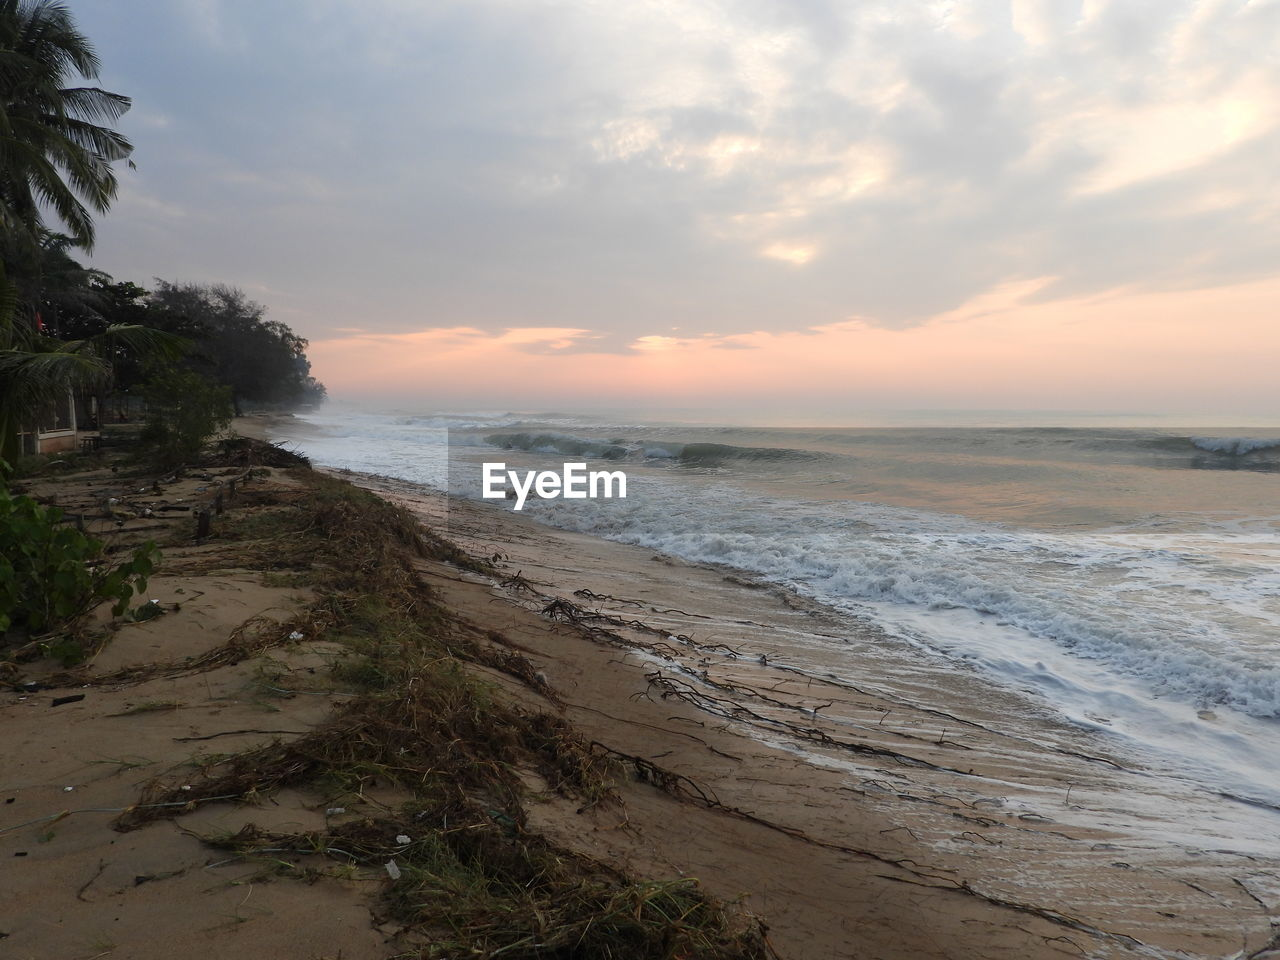 sky, sea, water, beach, land, sunset, beauty in nature, scenics - nature, cloud - sky, tranquility, horizon over water, tranquil scene, nature, horizon, no people, idyllic, plant, non-urban scene, sand, outdoors